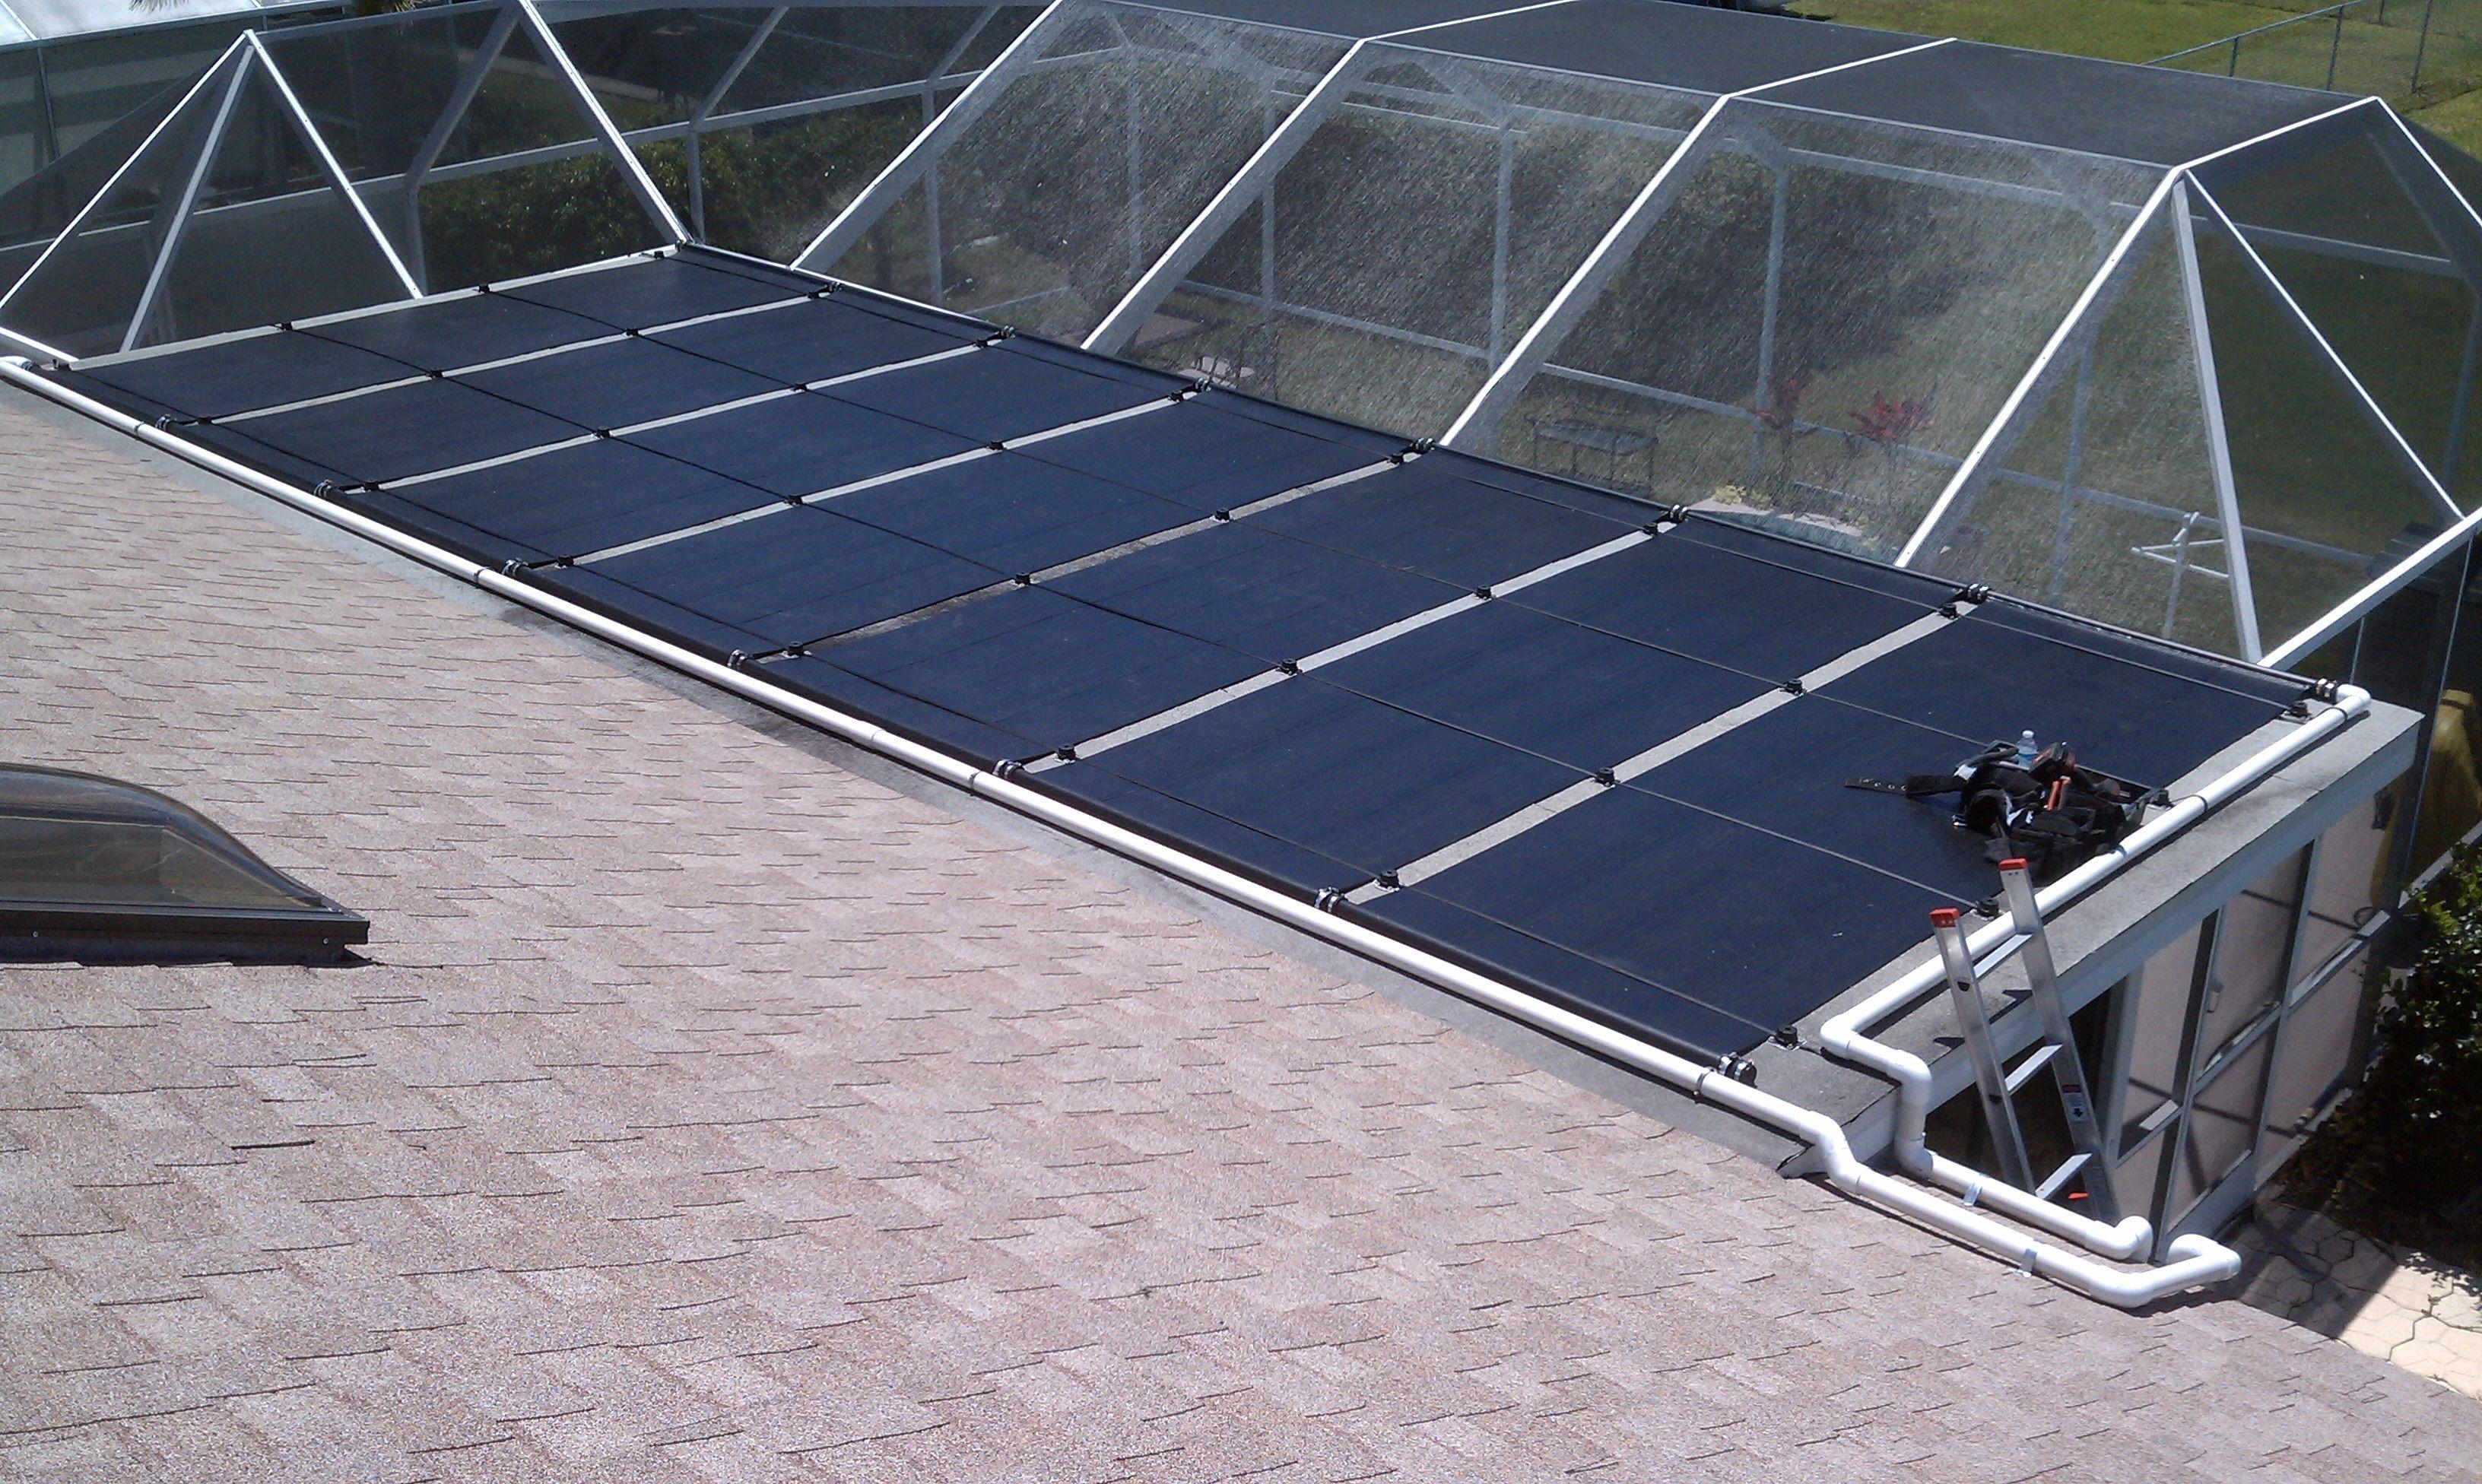 Vortex Solar Pool Heater Www Diysolarpoolheaterkits Com Solar Pool Electric Heat Pump Solar Pool Heater